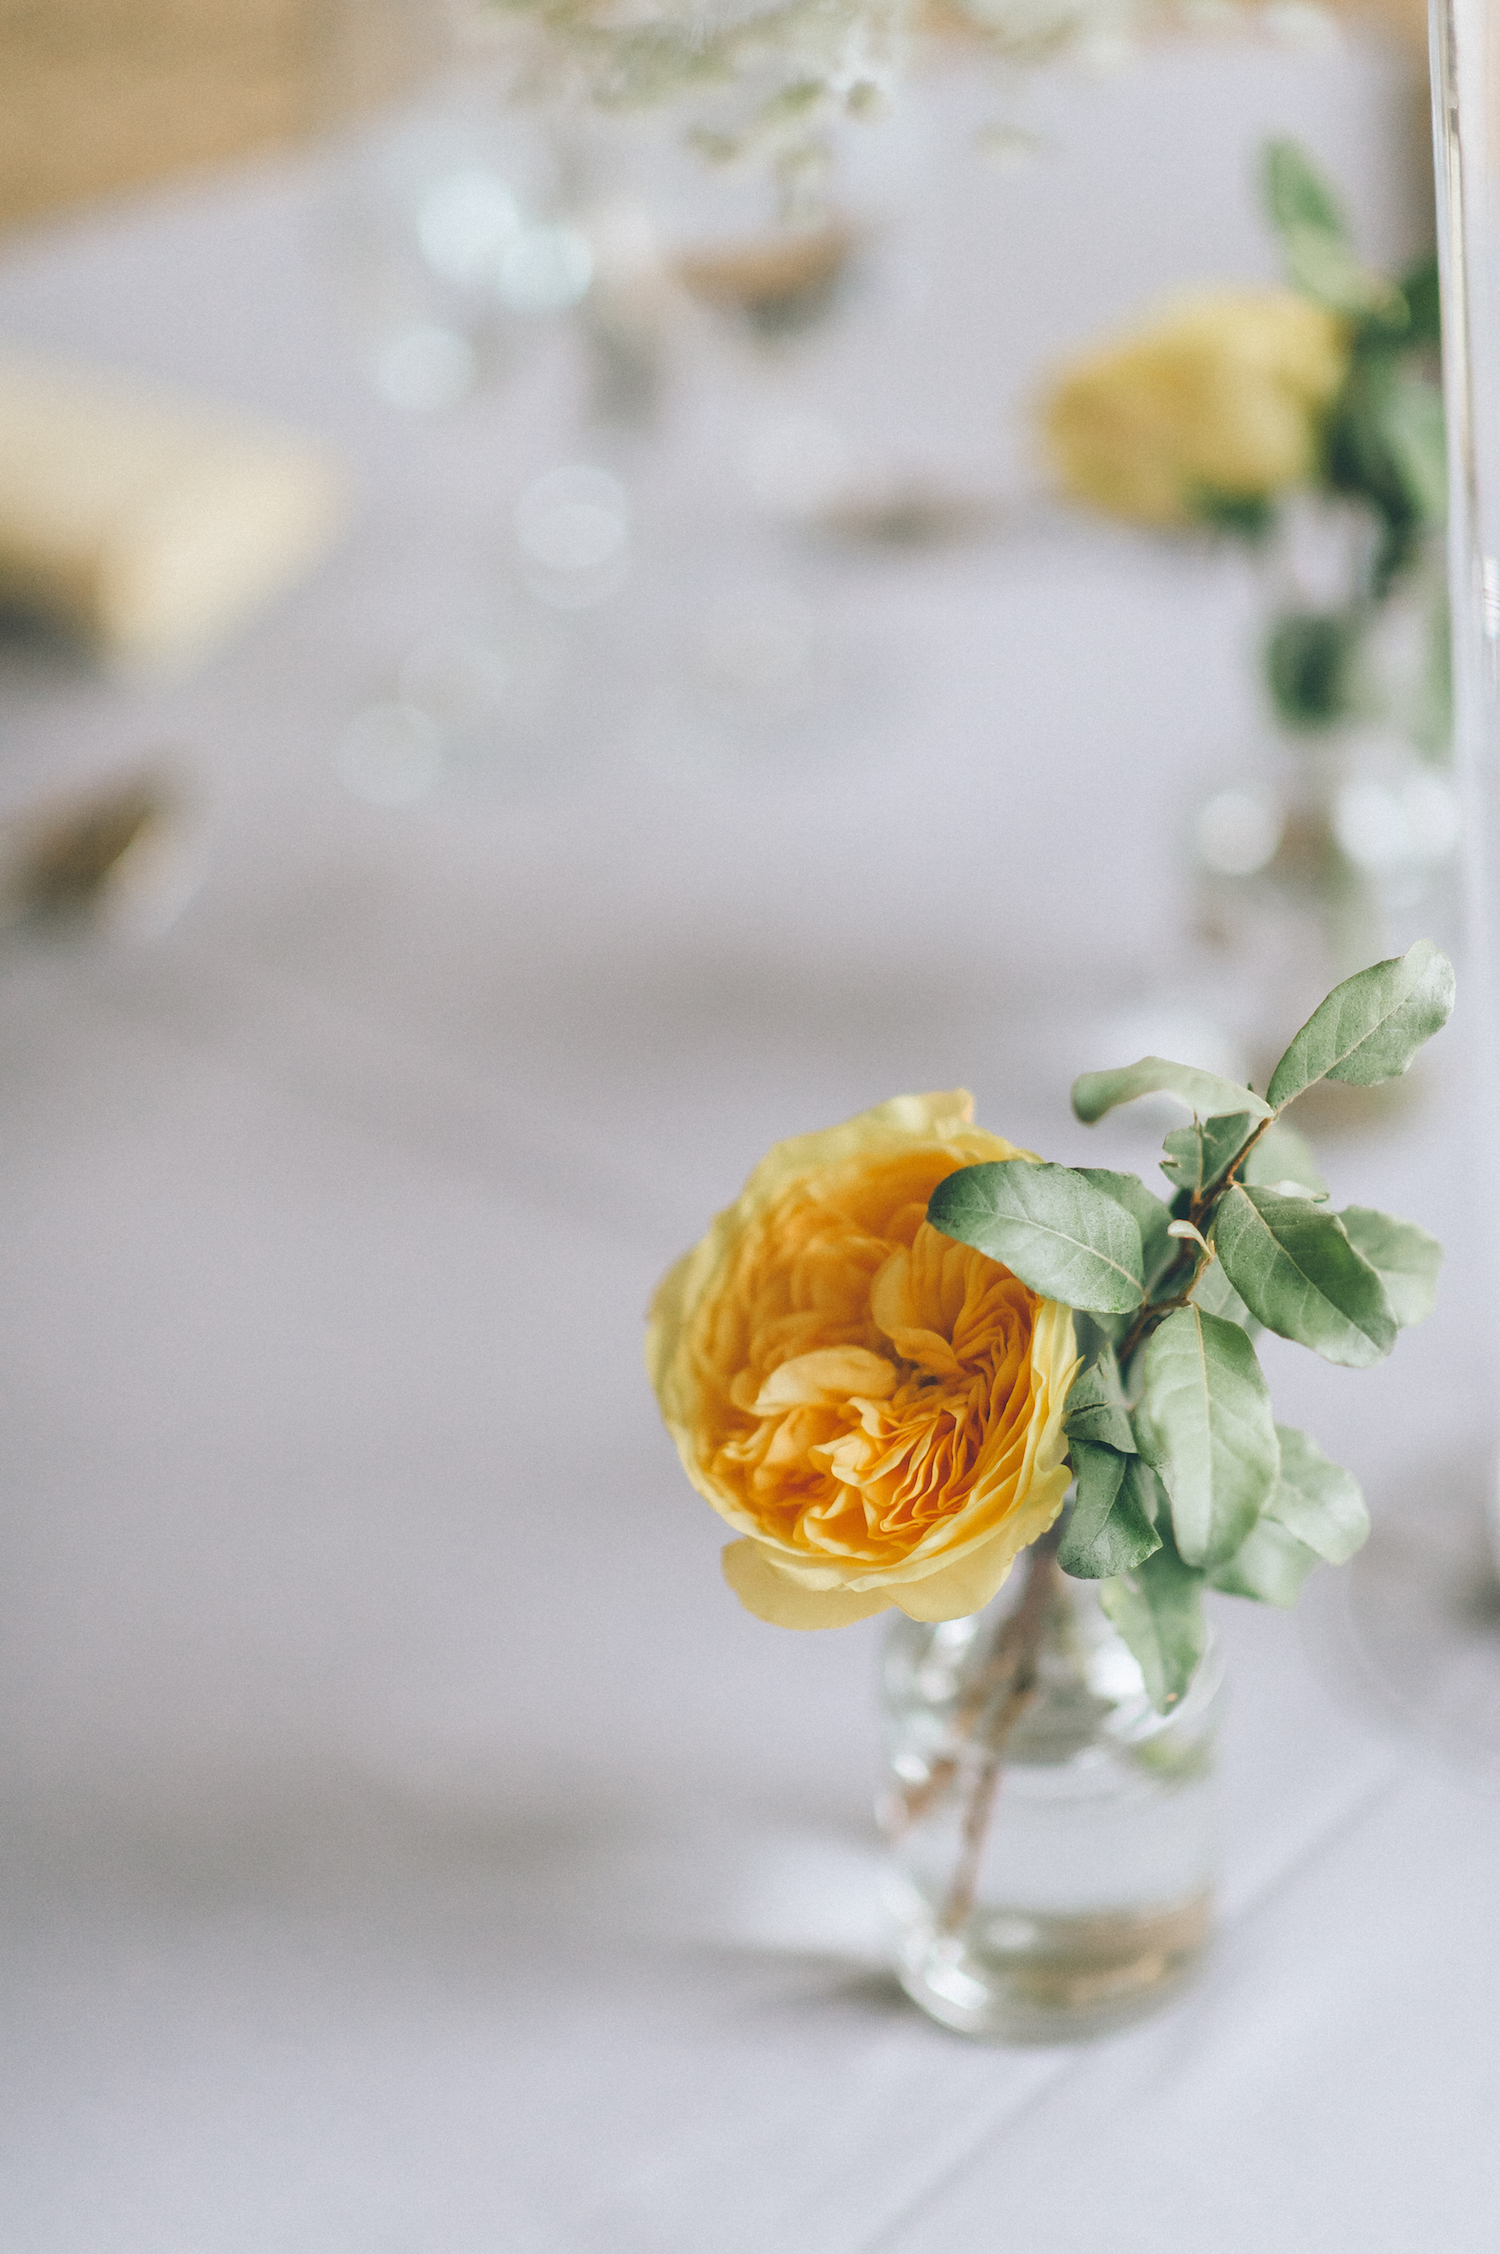 Yilan & Han - Full Aperture Floral - NYC-292 copy.jpg